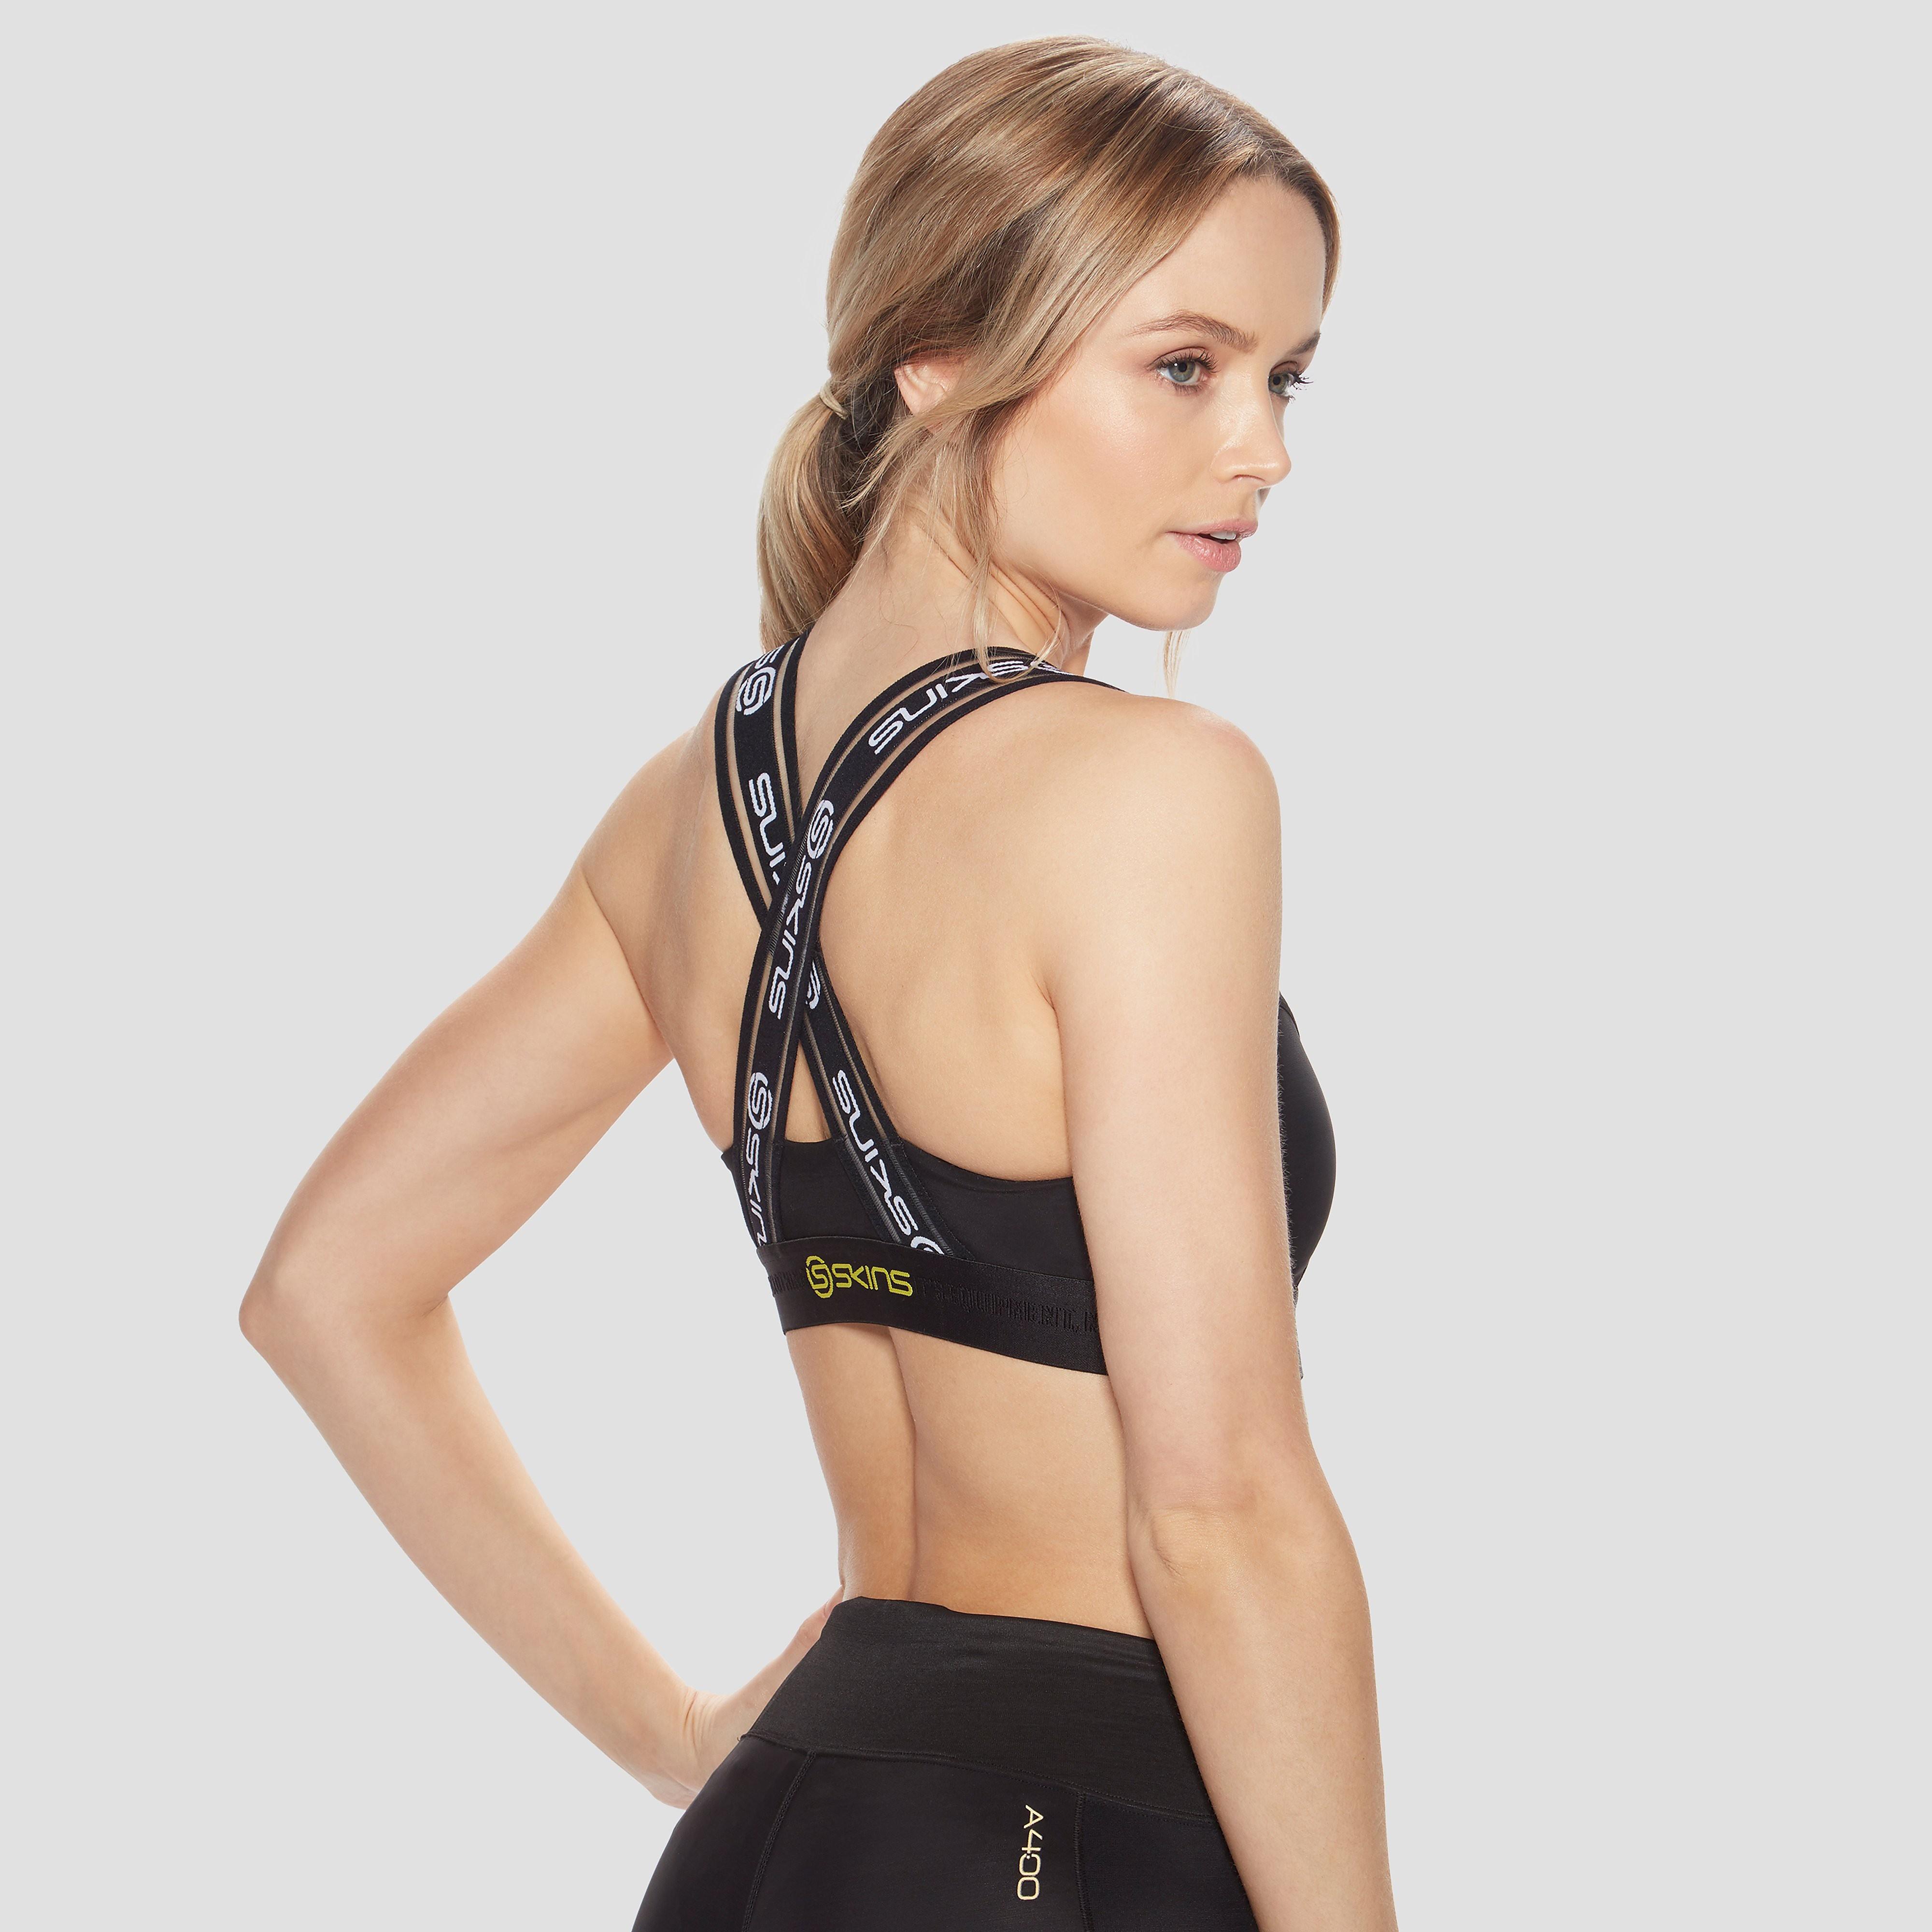 Skins DNAmic Speed Women's Sports Bra